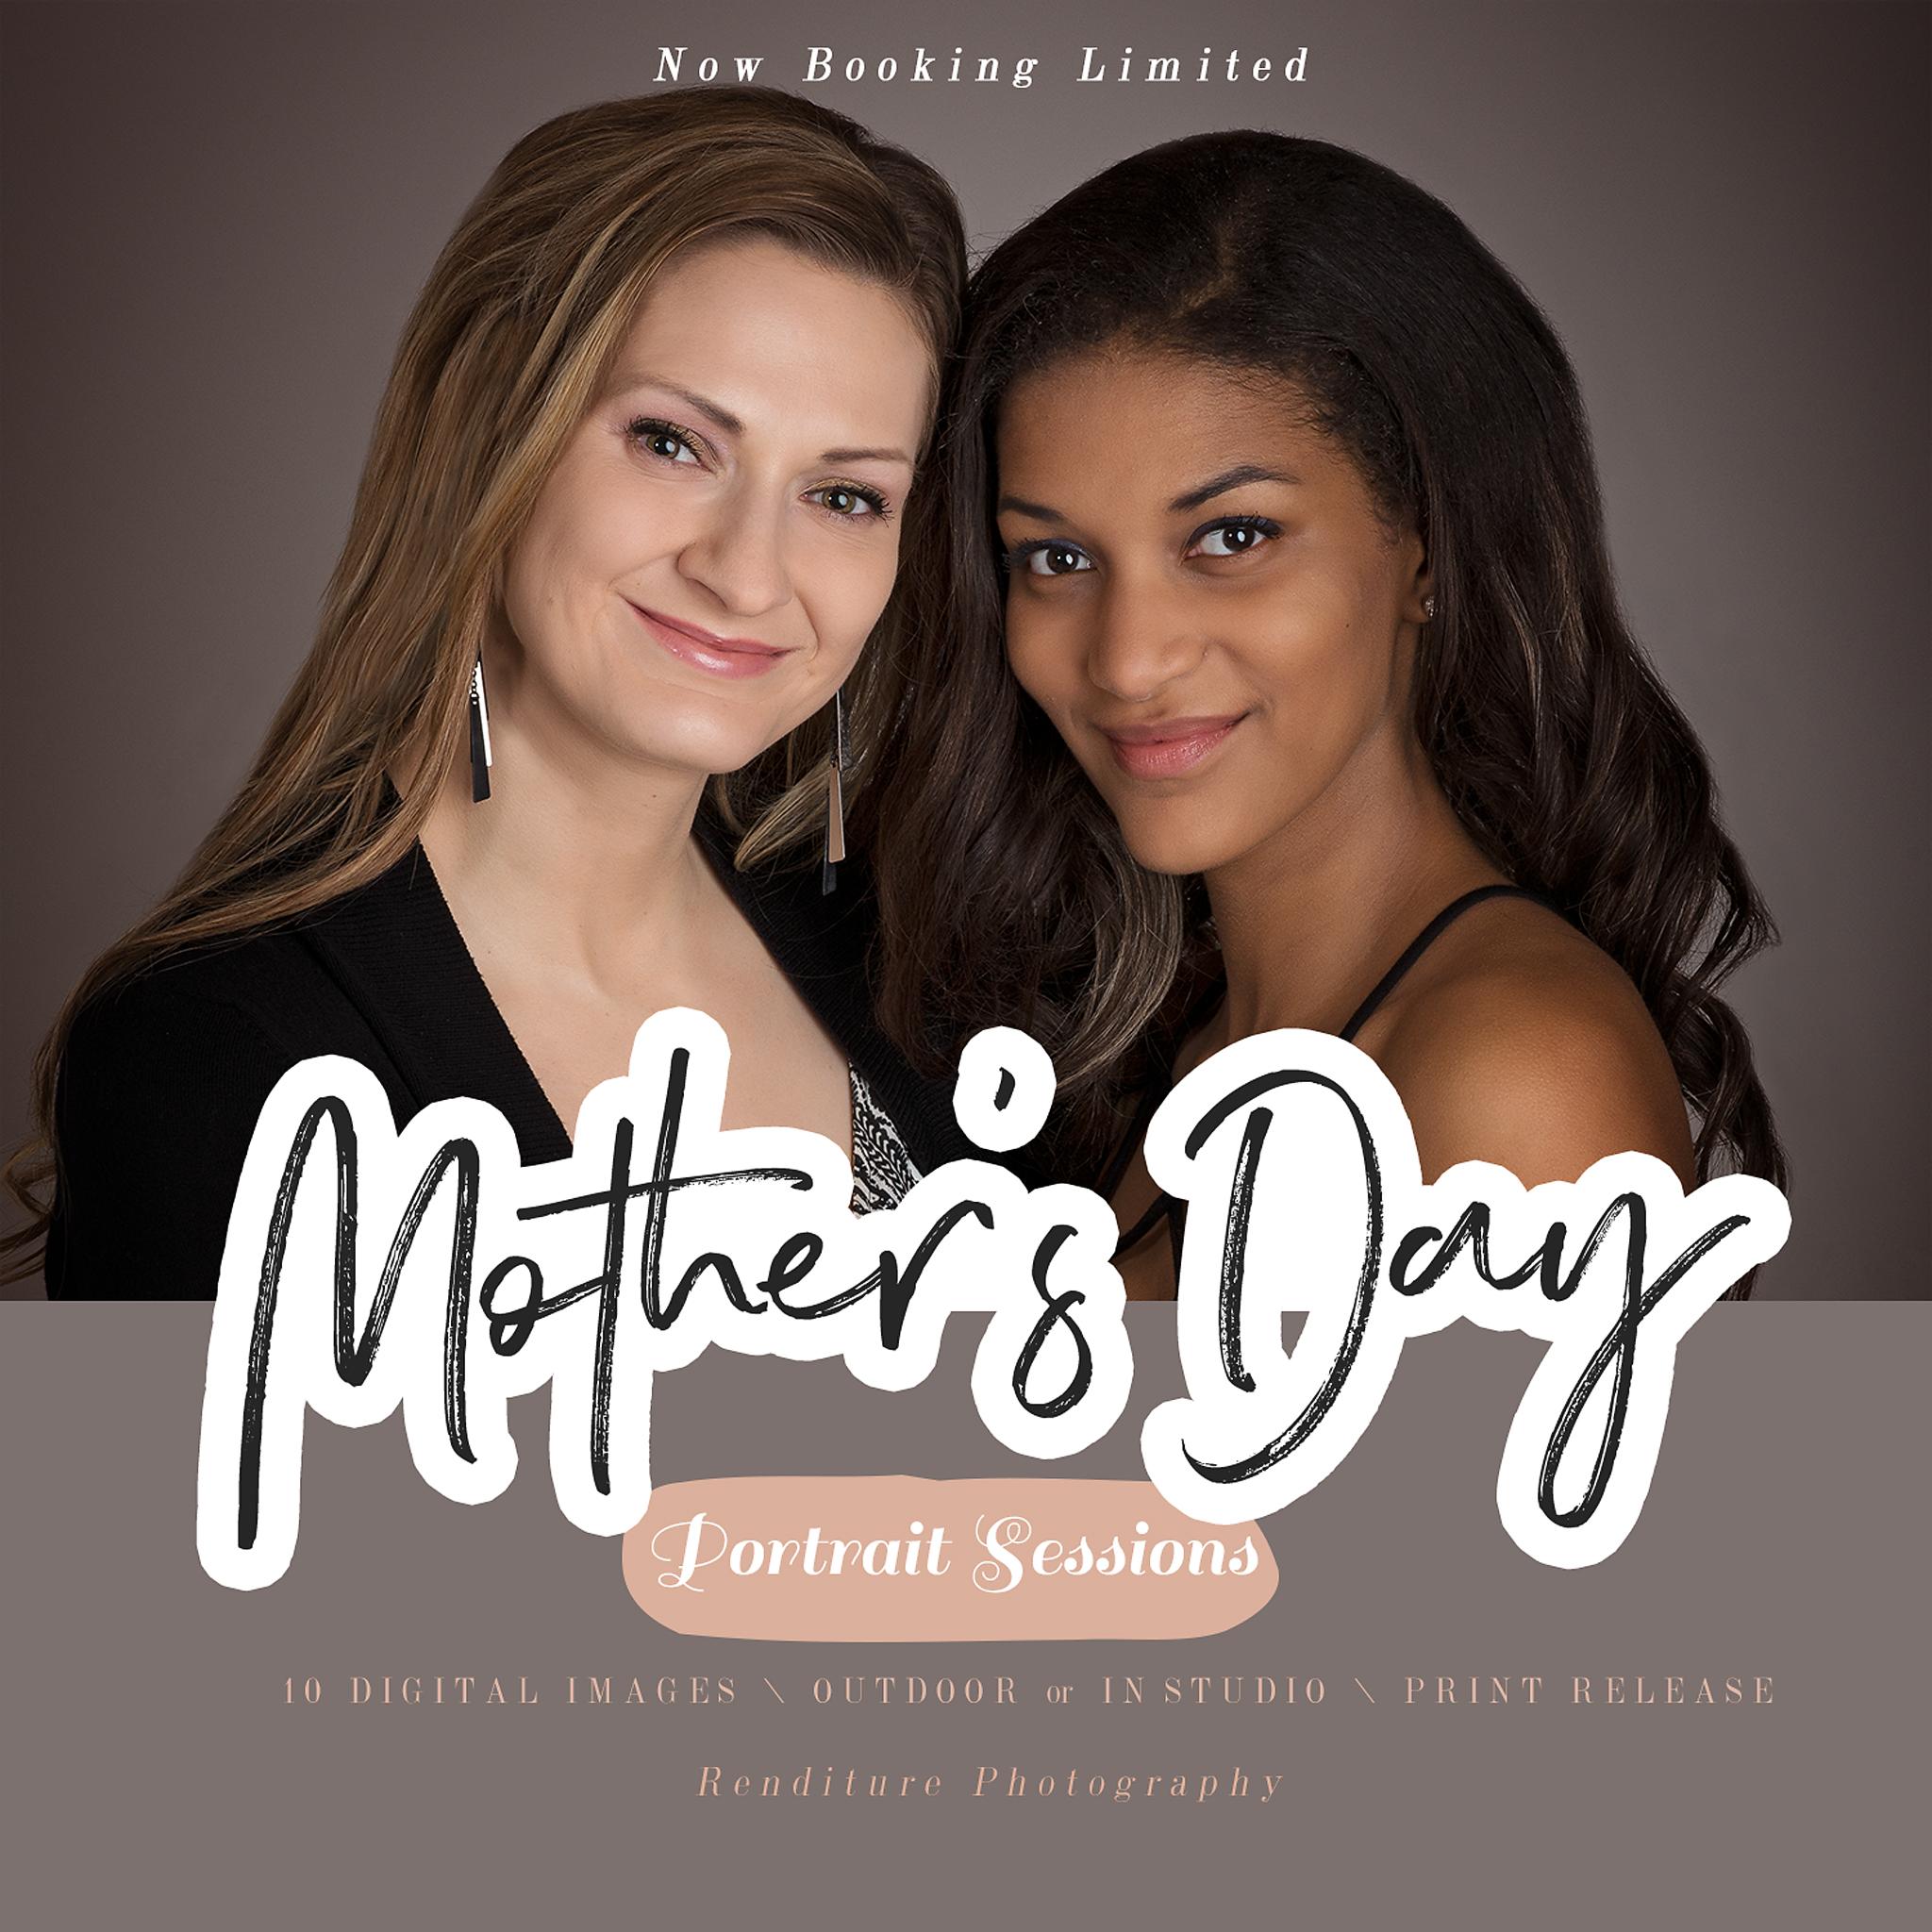 Saskatoon-2018-Family-Renditure-Photography-Photographer-Maternity-MothersDay-Saskatchewan-Mothers-Day604FBR.jpg